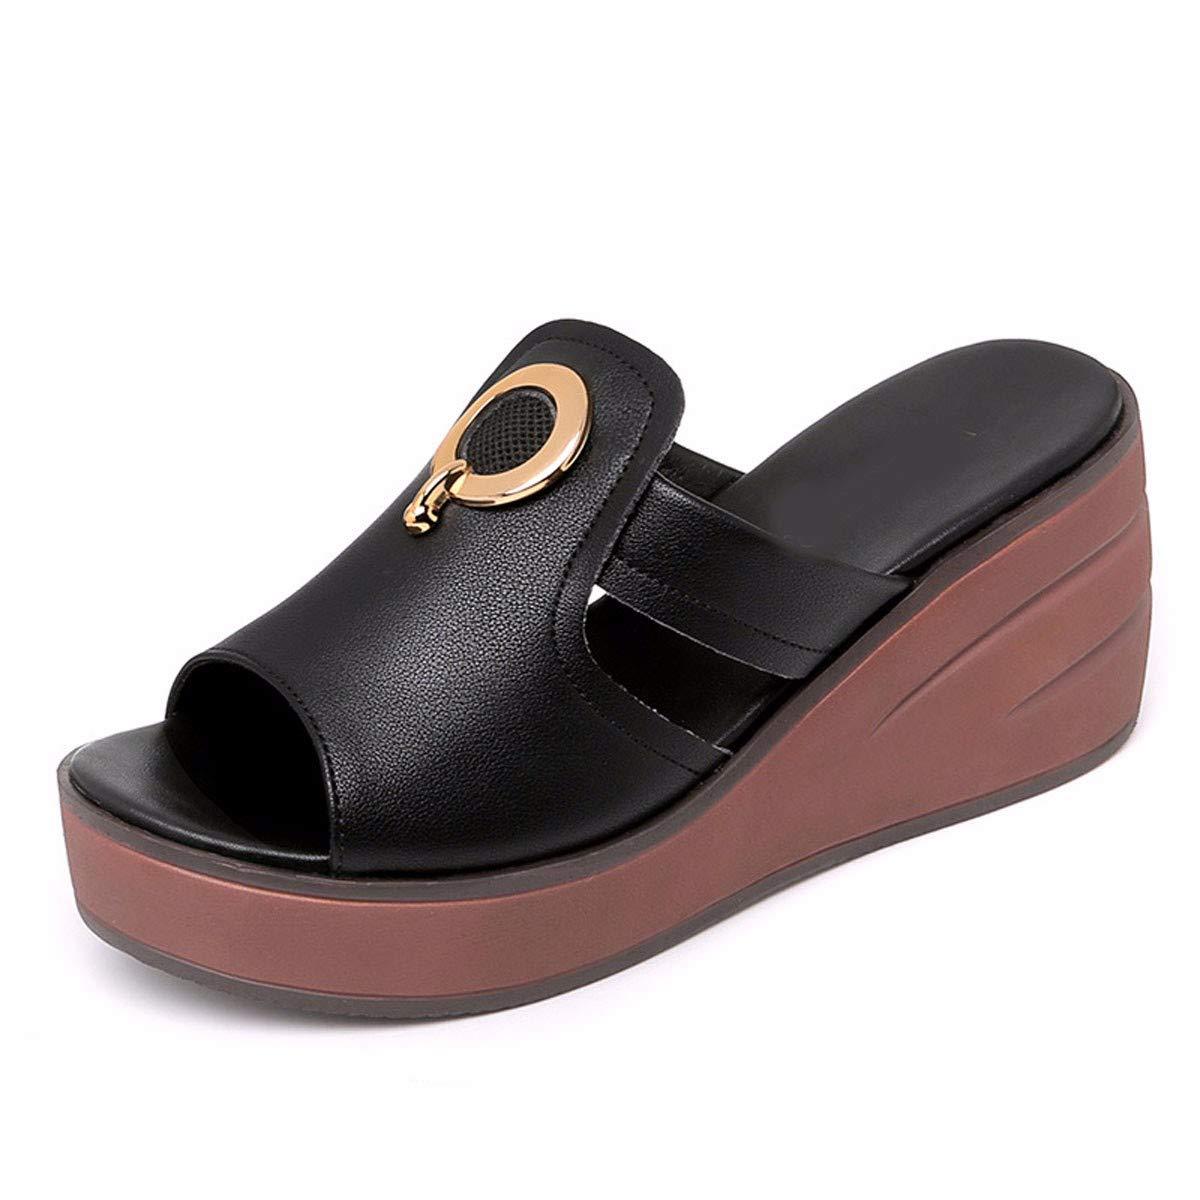 GTVERNH Frauen Schuhe/Frauen-Pantoffeln Steigung Heels Sommer Mode Verschleiß Cork